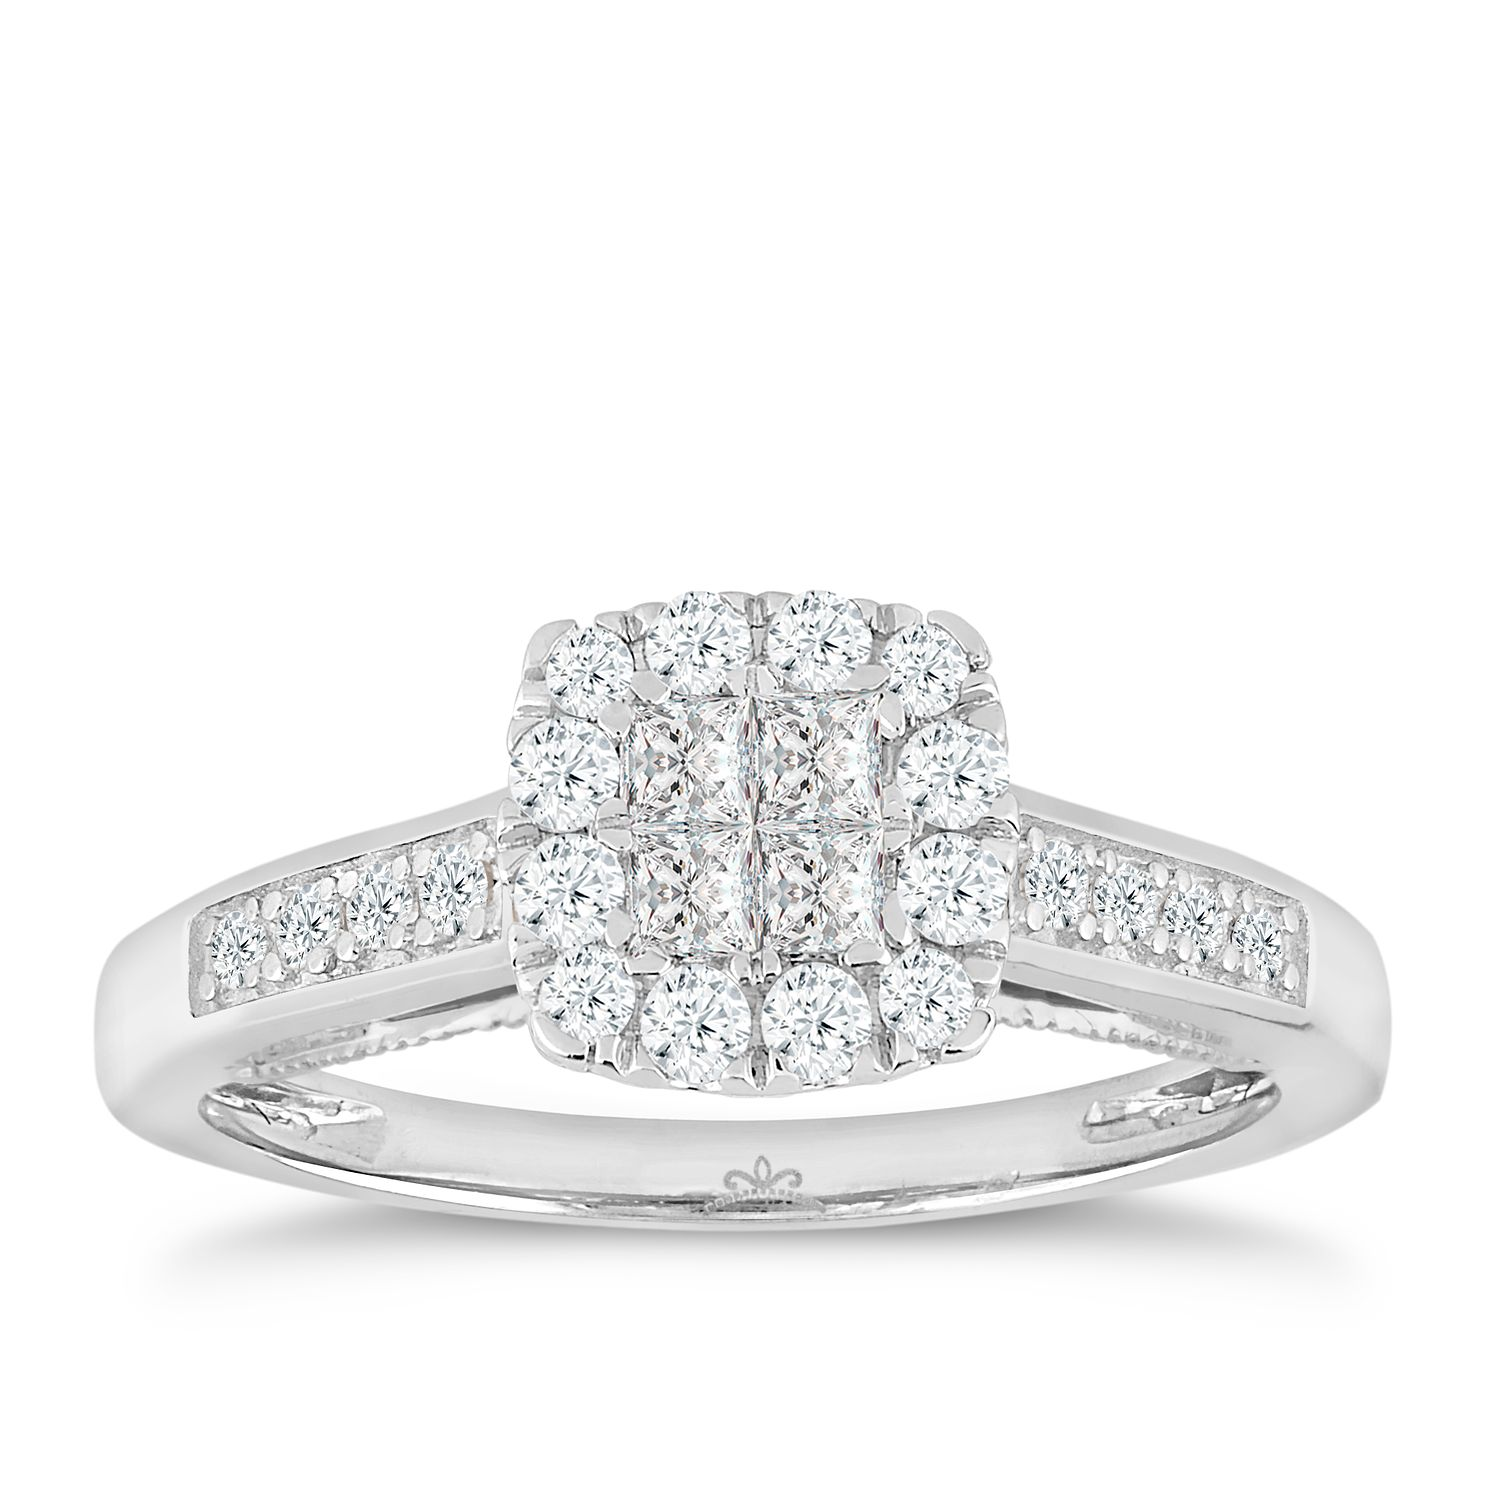 9ae1877f9 9ct White Gold 1/2 Carat Princessa Diamond Cluster Ring